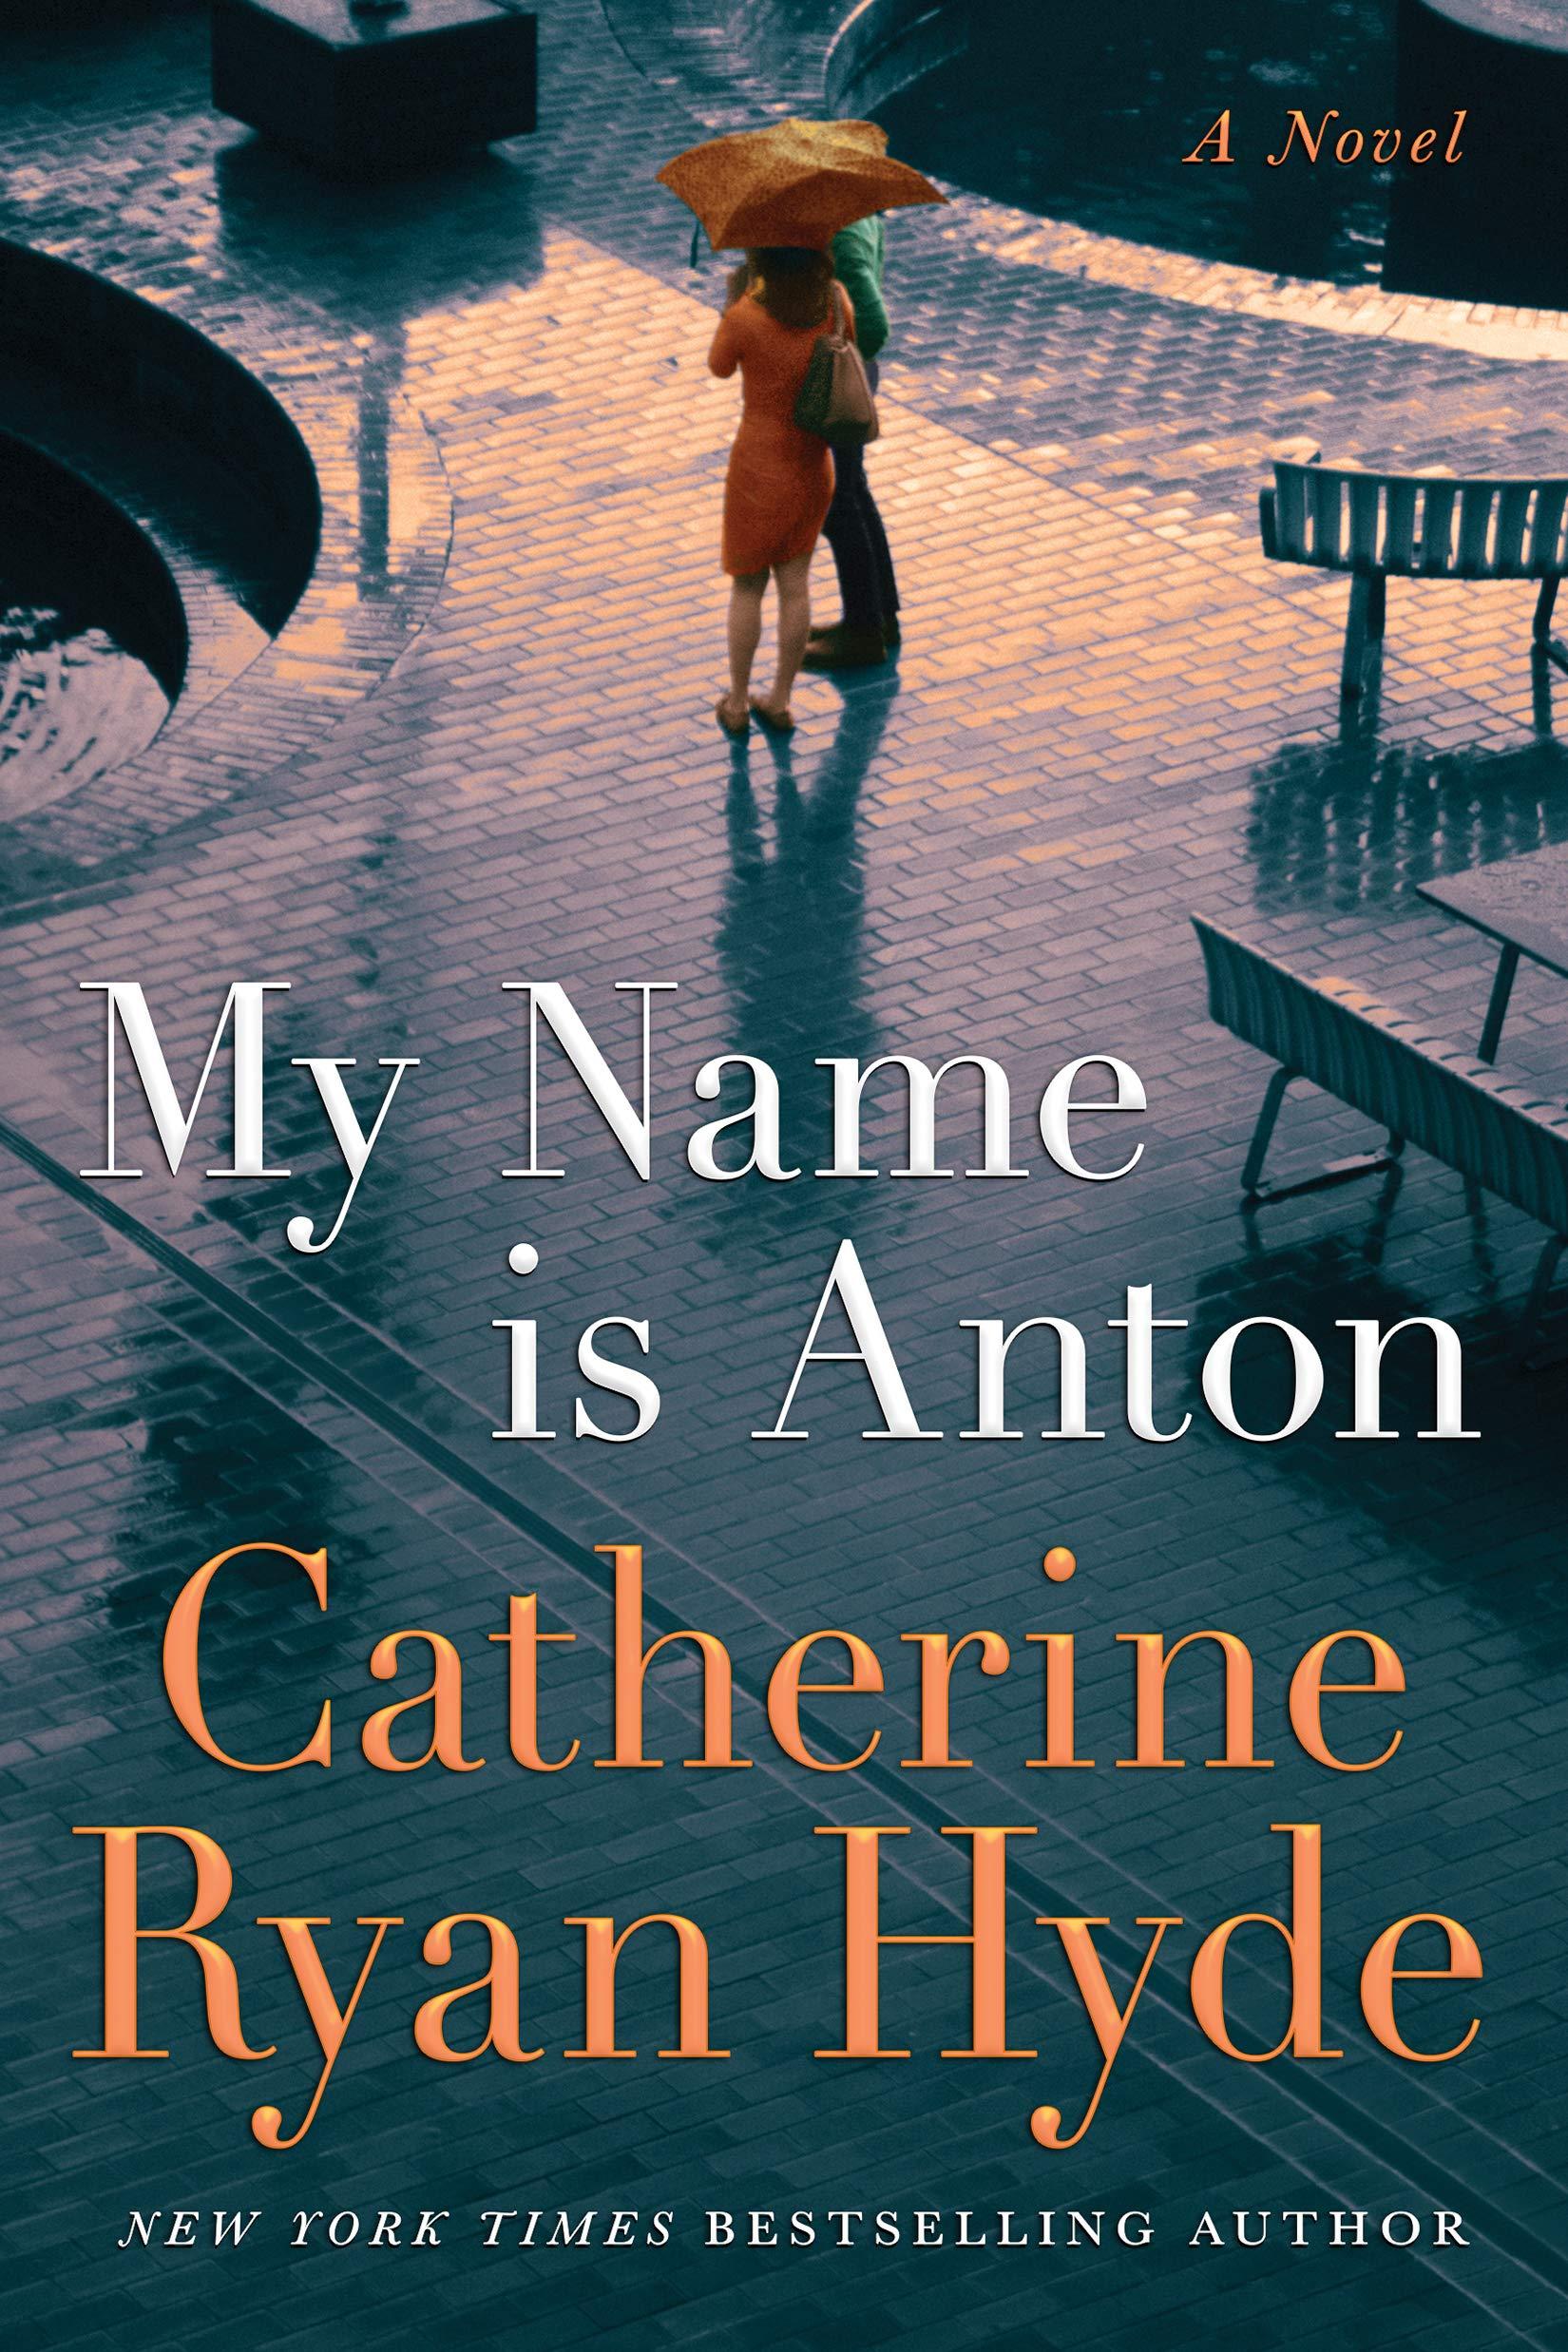 My Name Is AntonbyCatherine Ryan Hyde